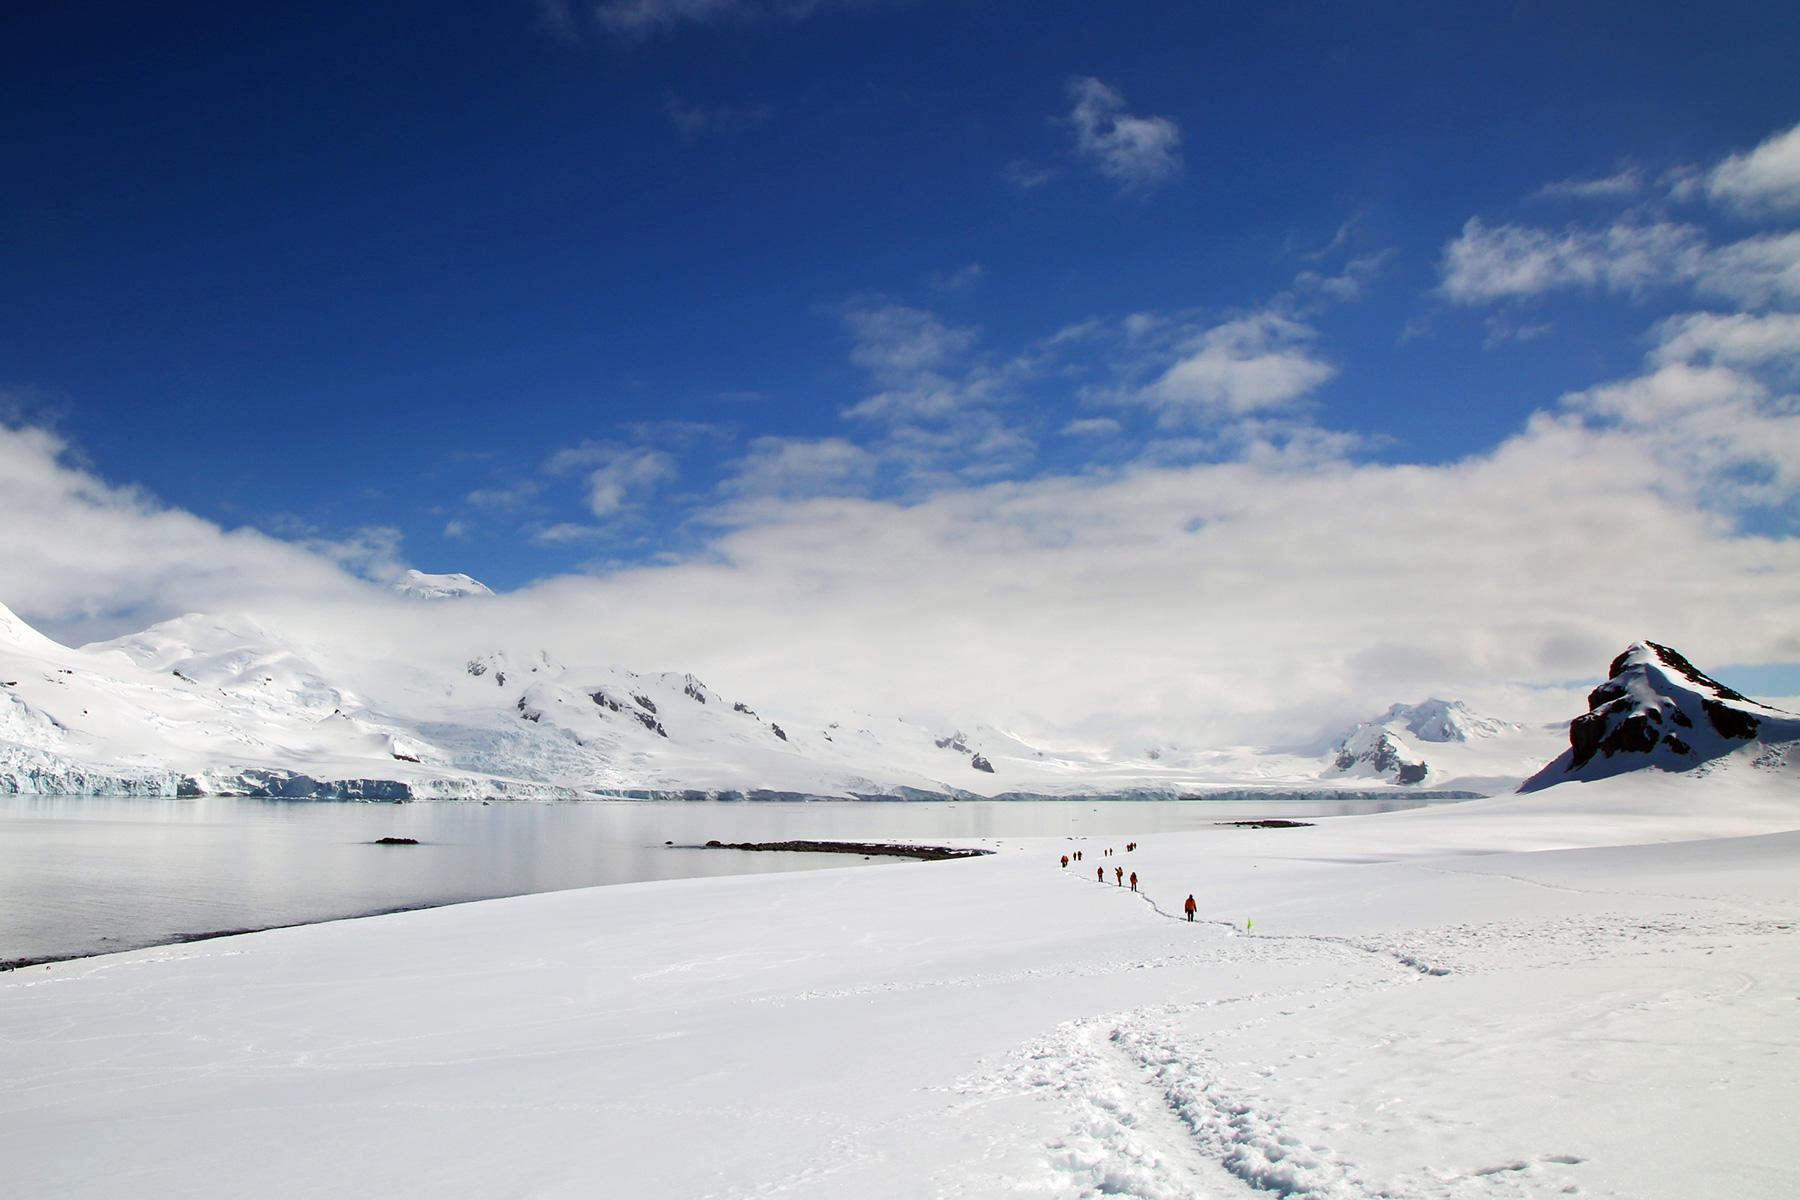 4_Antartica101_ListenToYourGuide_shutterstock_386605618_1